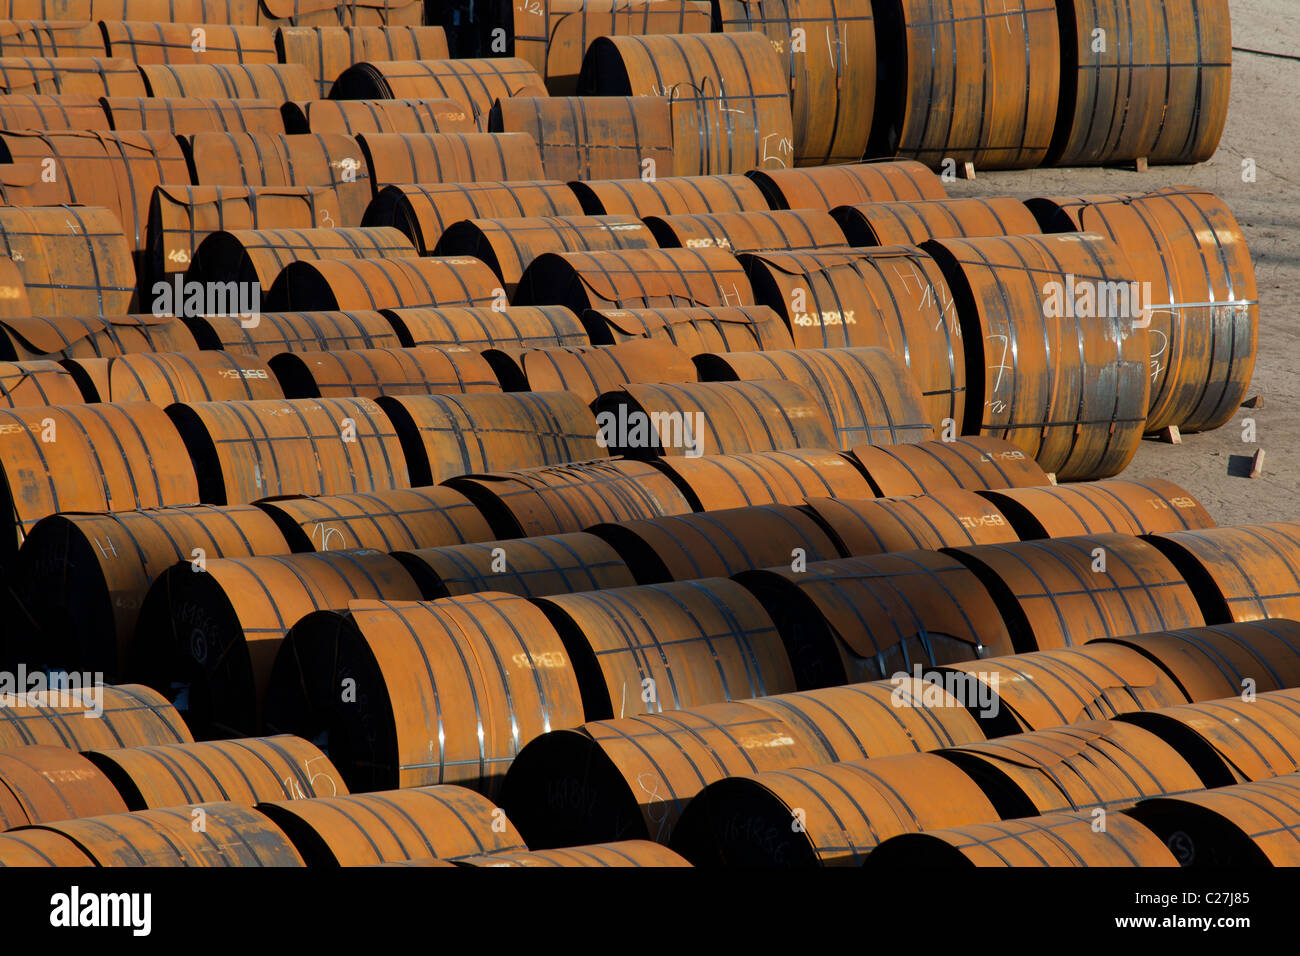 Port of Pasaia, Gipuzkoa, Spain - Stock Image